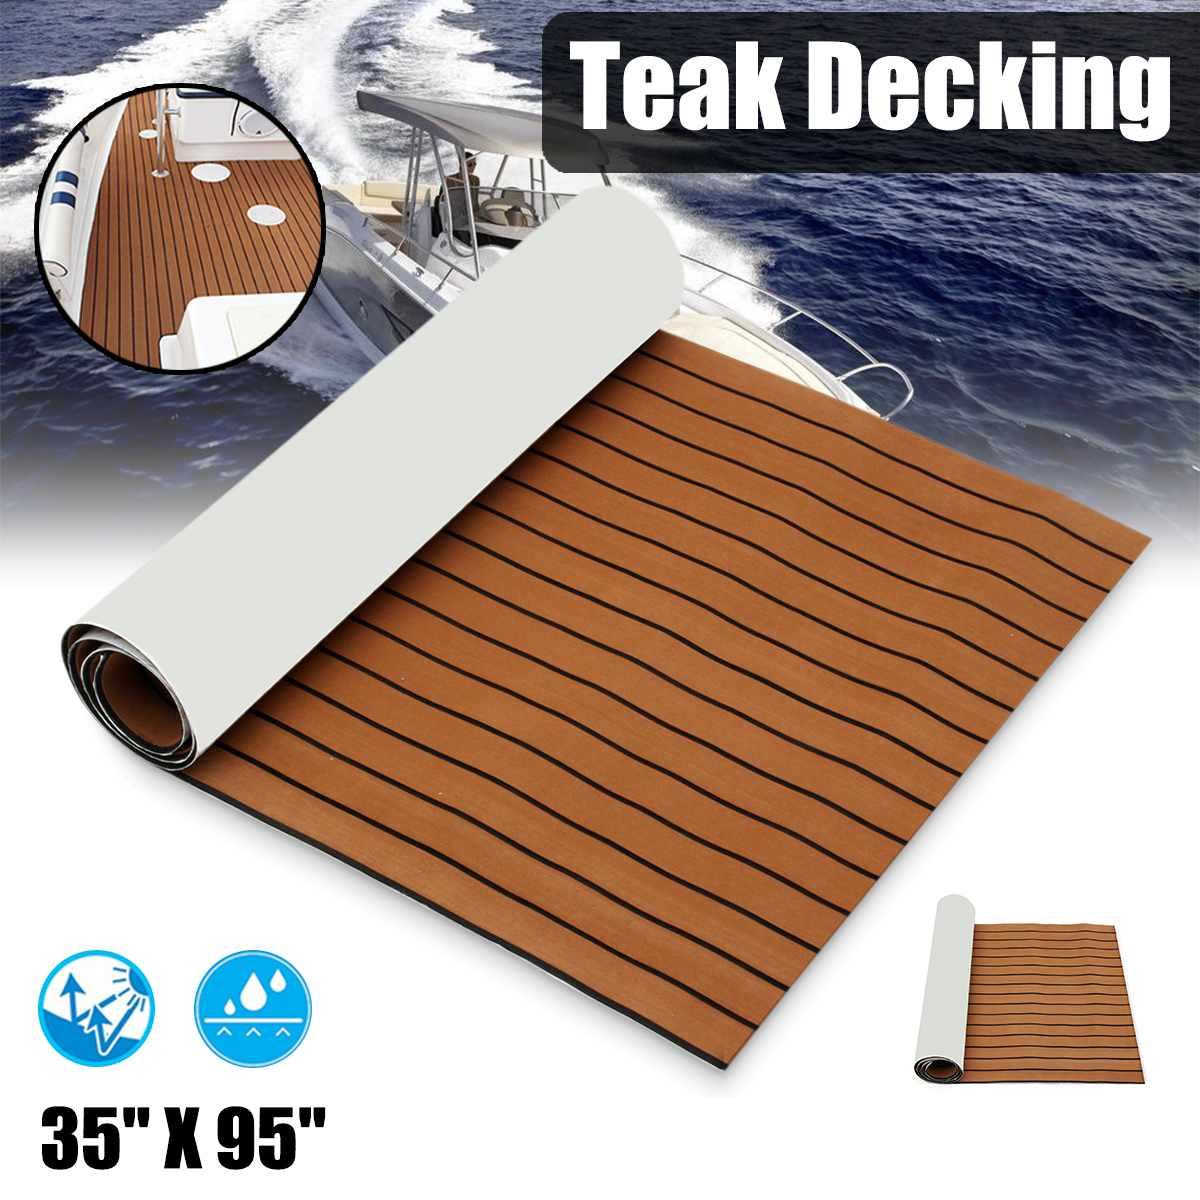 2400x900x5mm Self-Adhesive Foam Teak Decking EVA Foam Marine Flooring Faux Boat Decking Sheet Accessories Marine 3 Styles